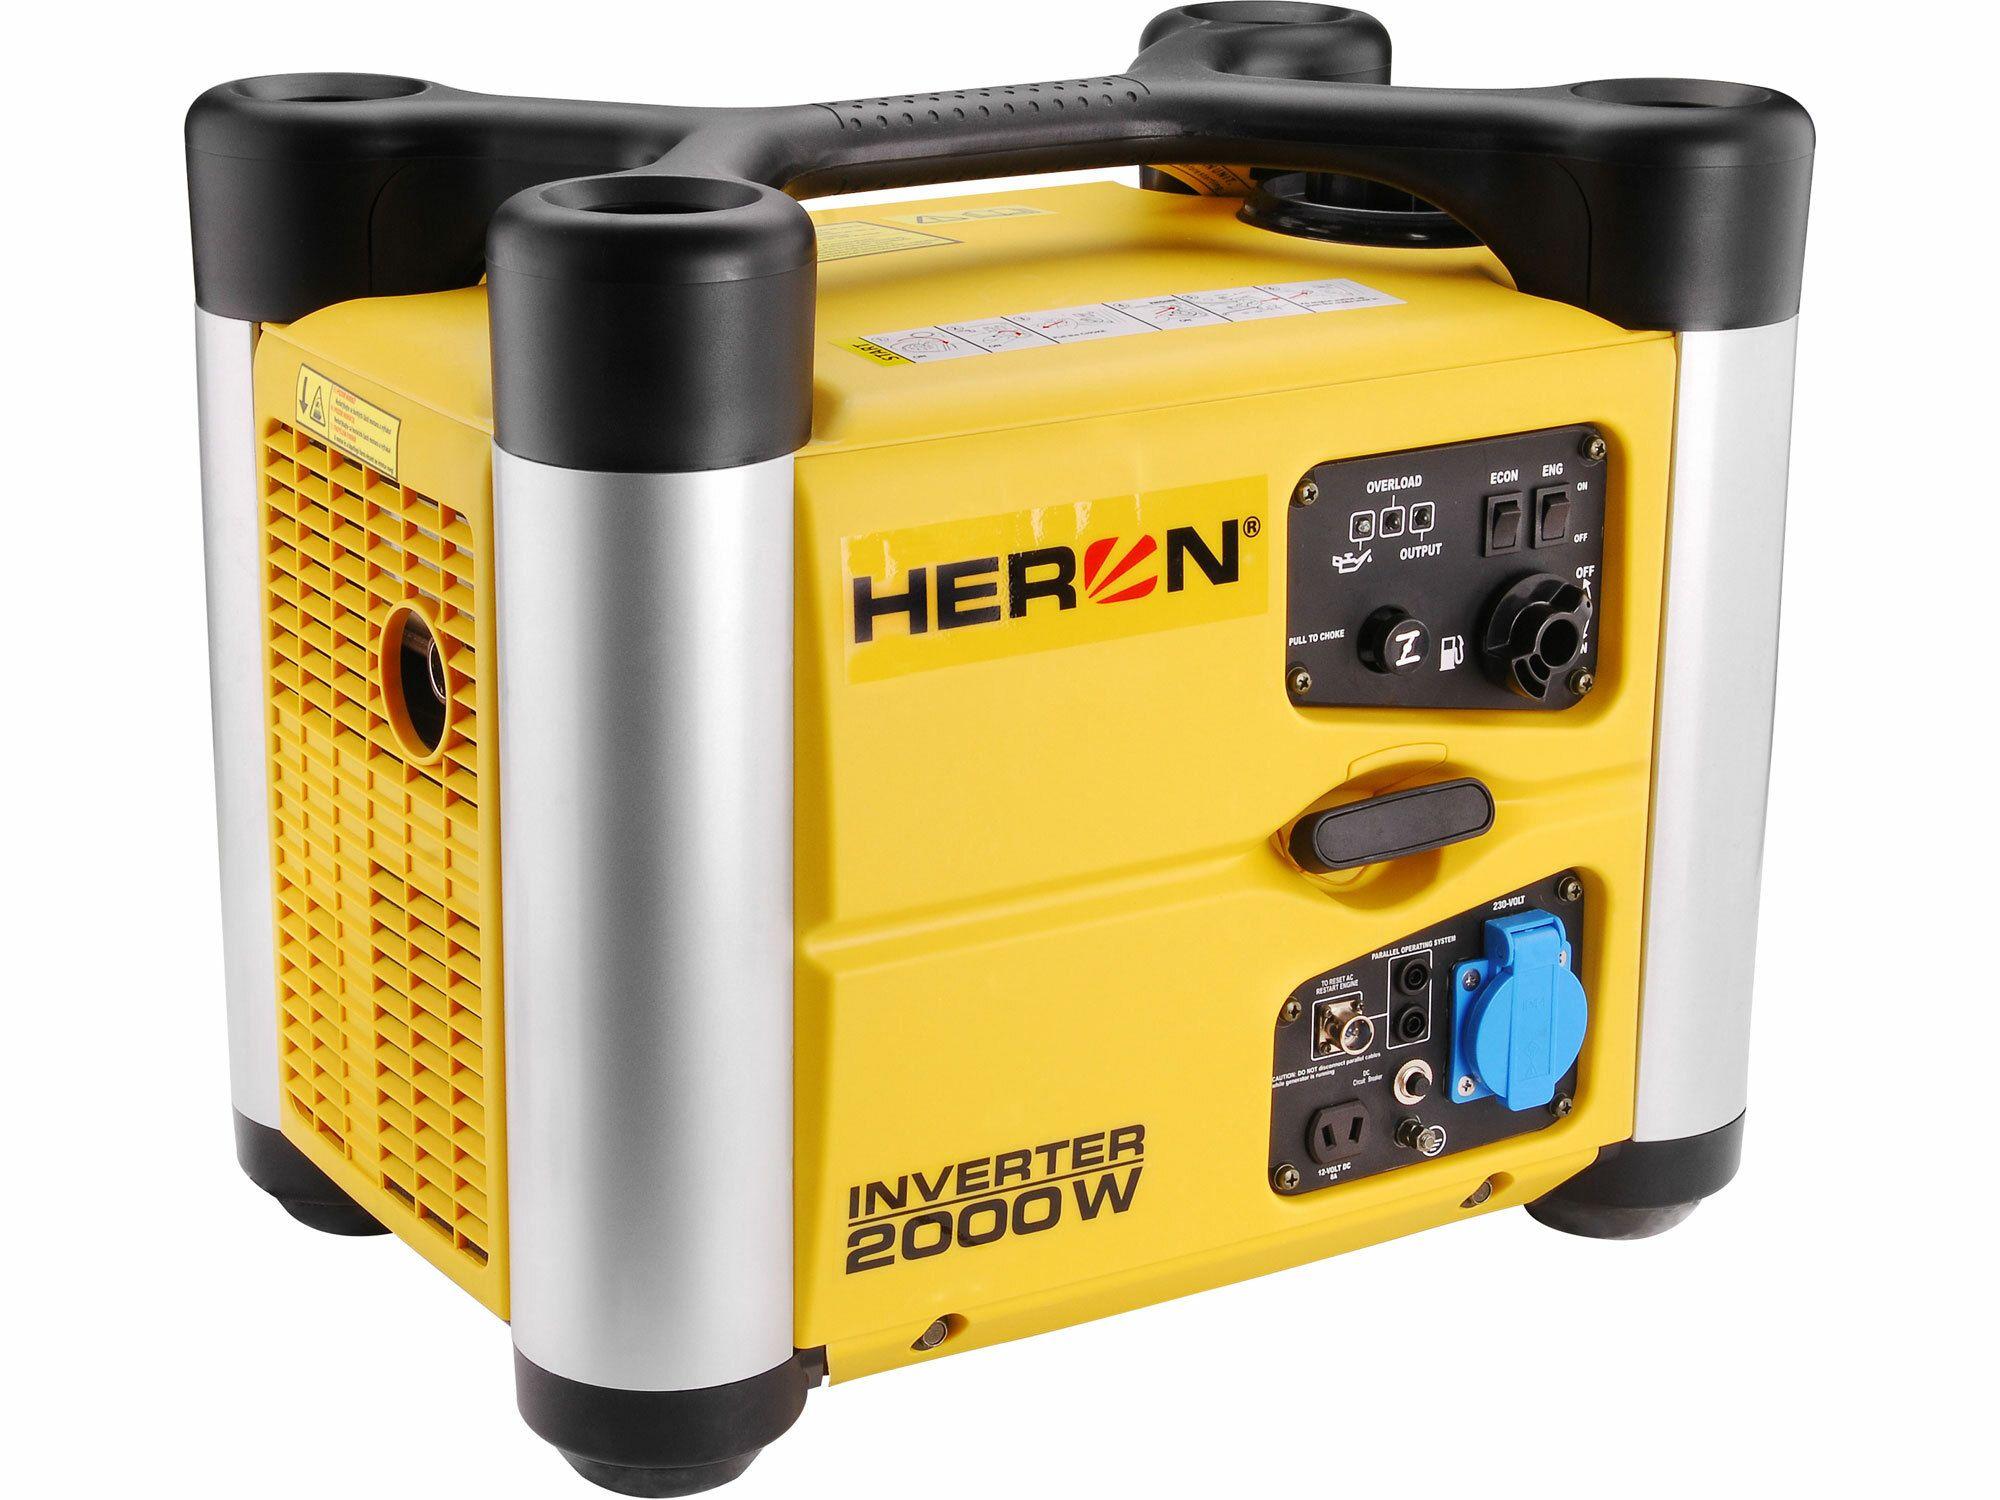 Elektrocentrála digitálna invertorová 3,0HP, 2,0kW, HERON, DGI 20 SP, 8896217